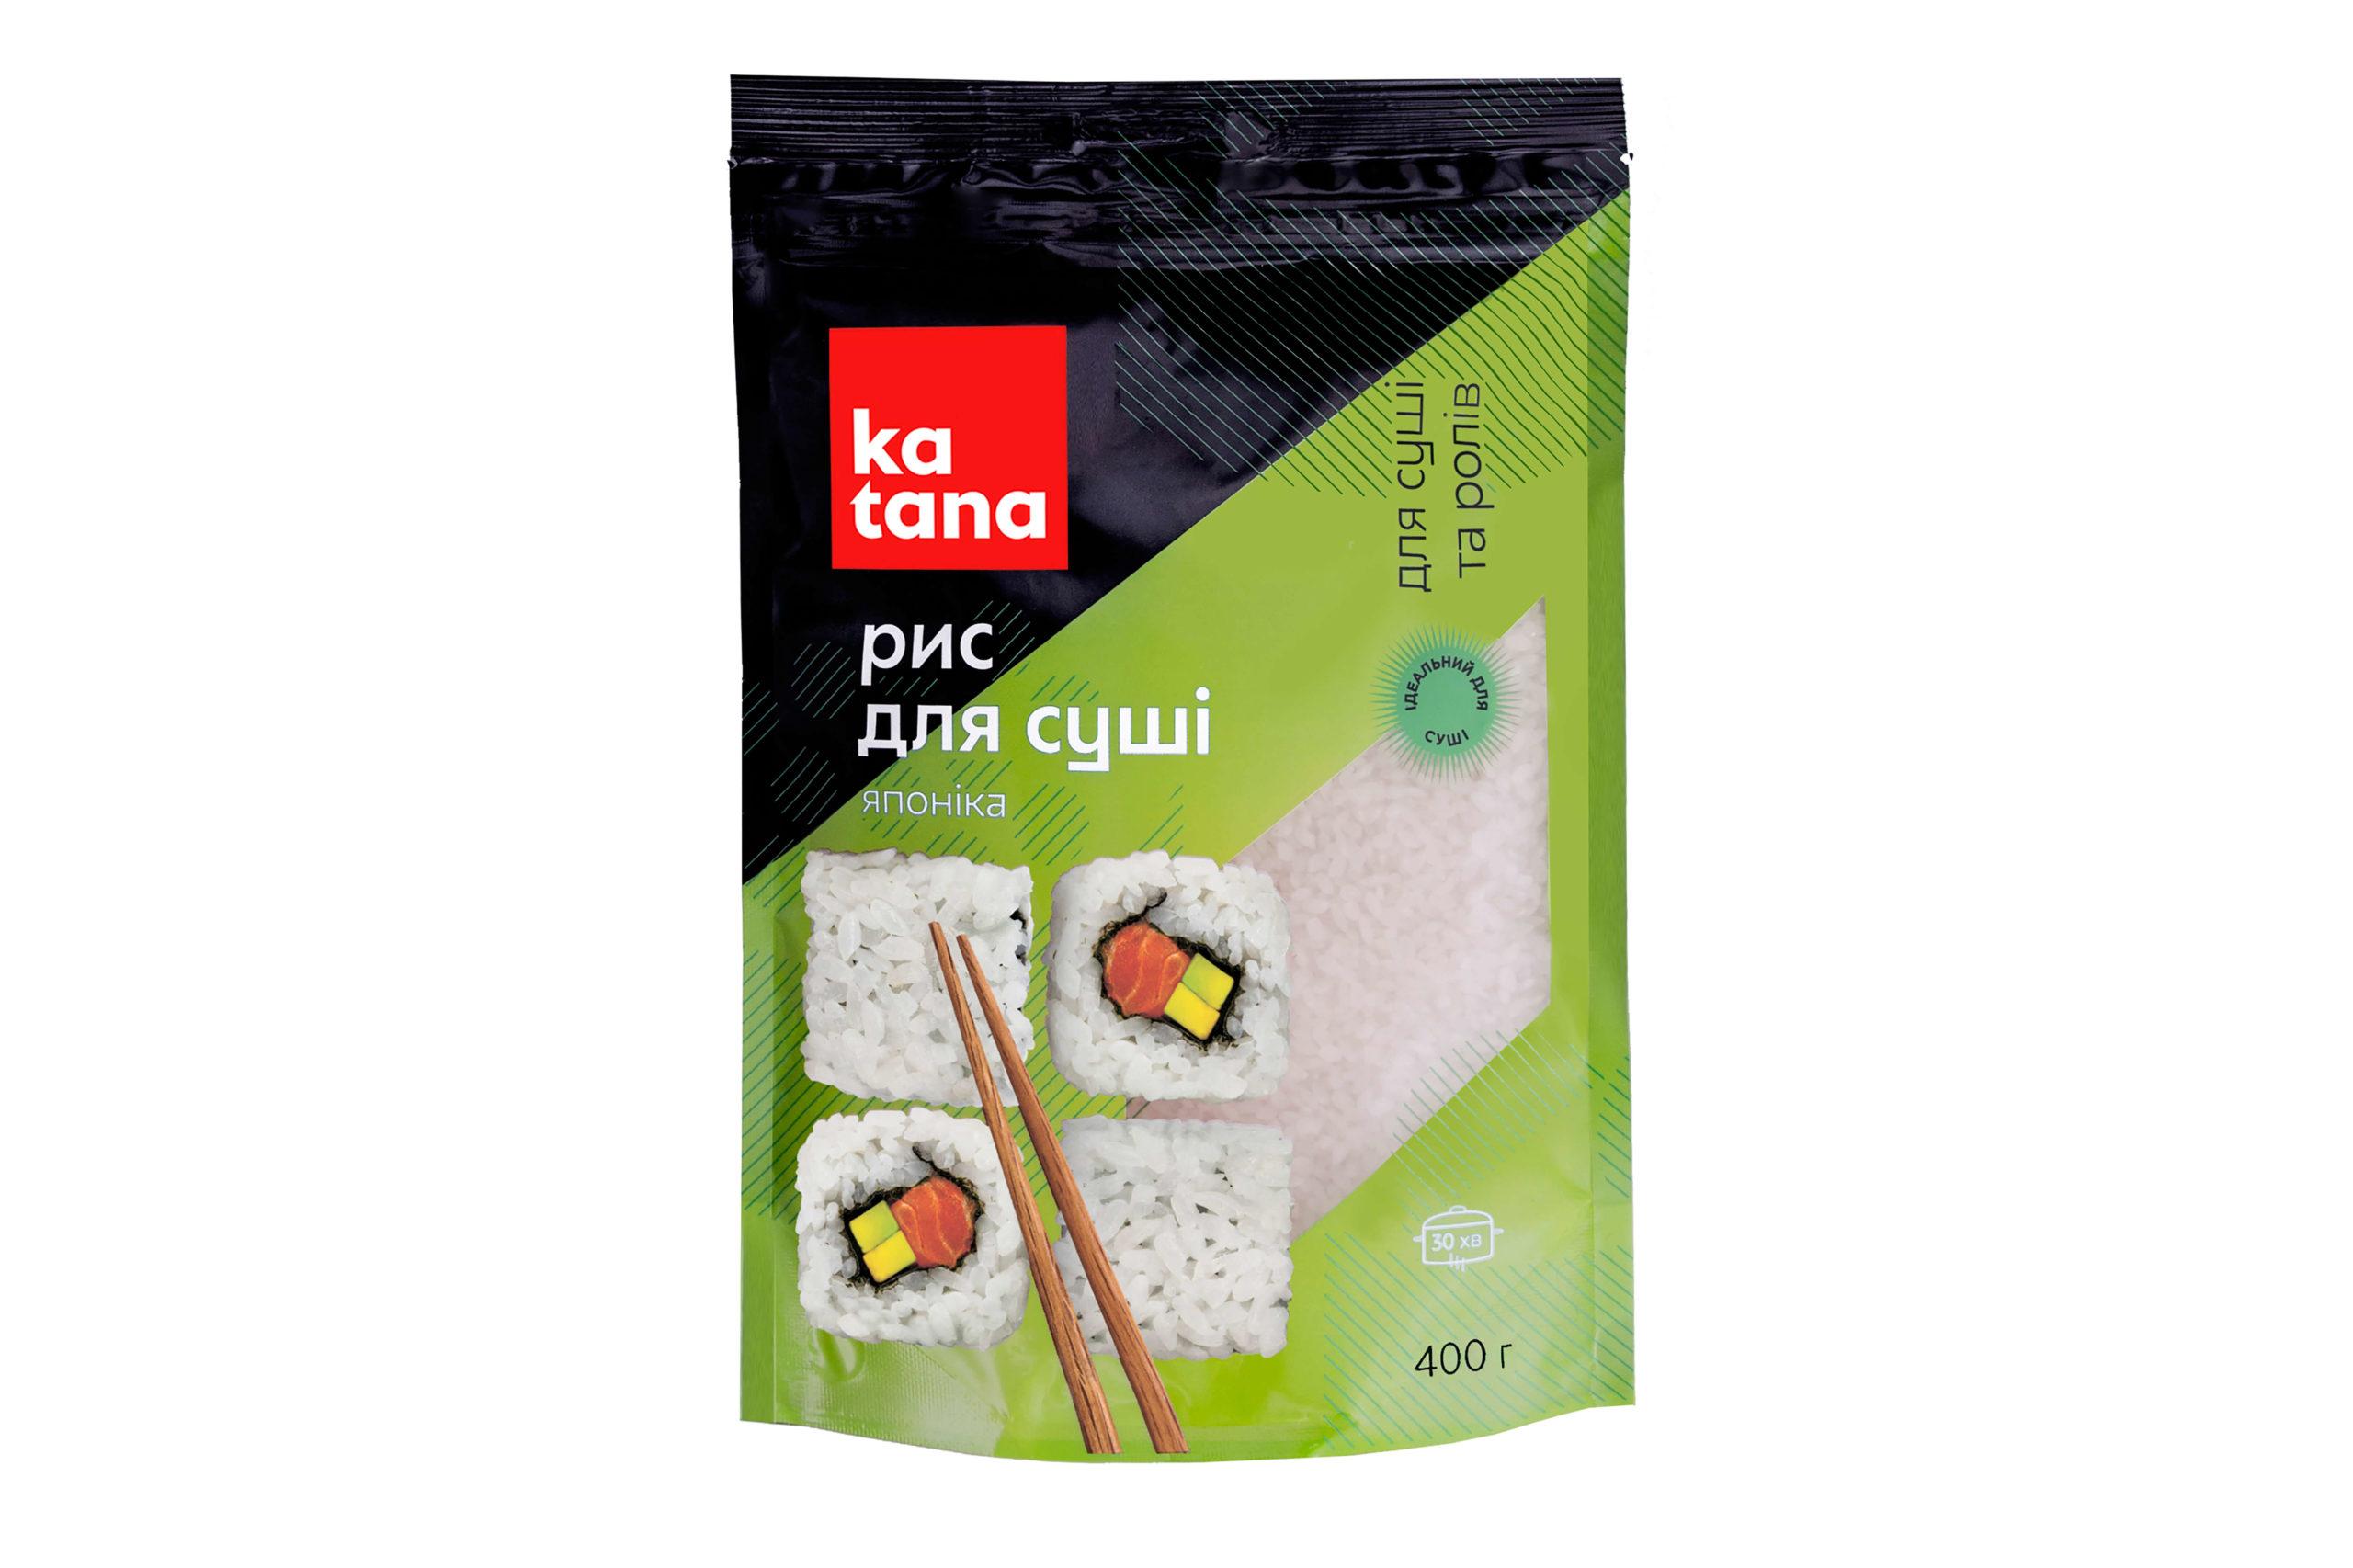 Рис для суши Японика Katana